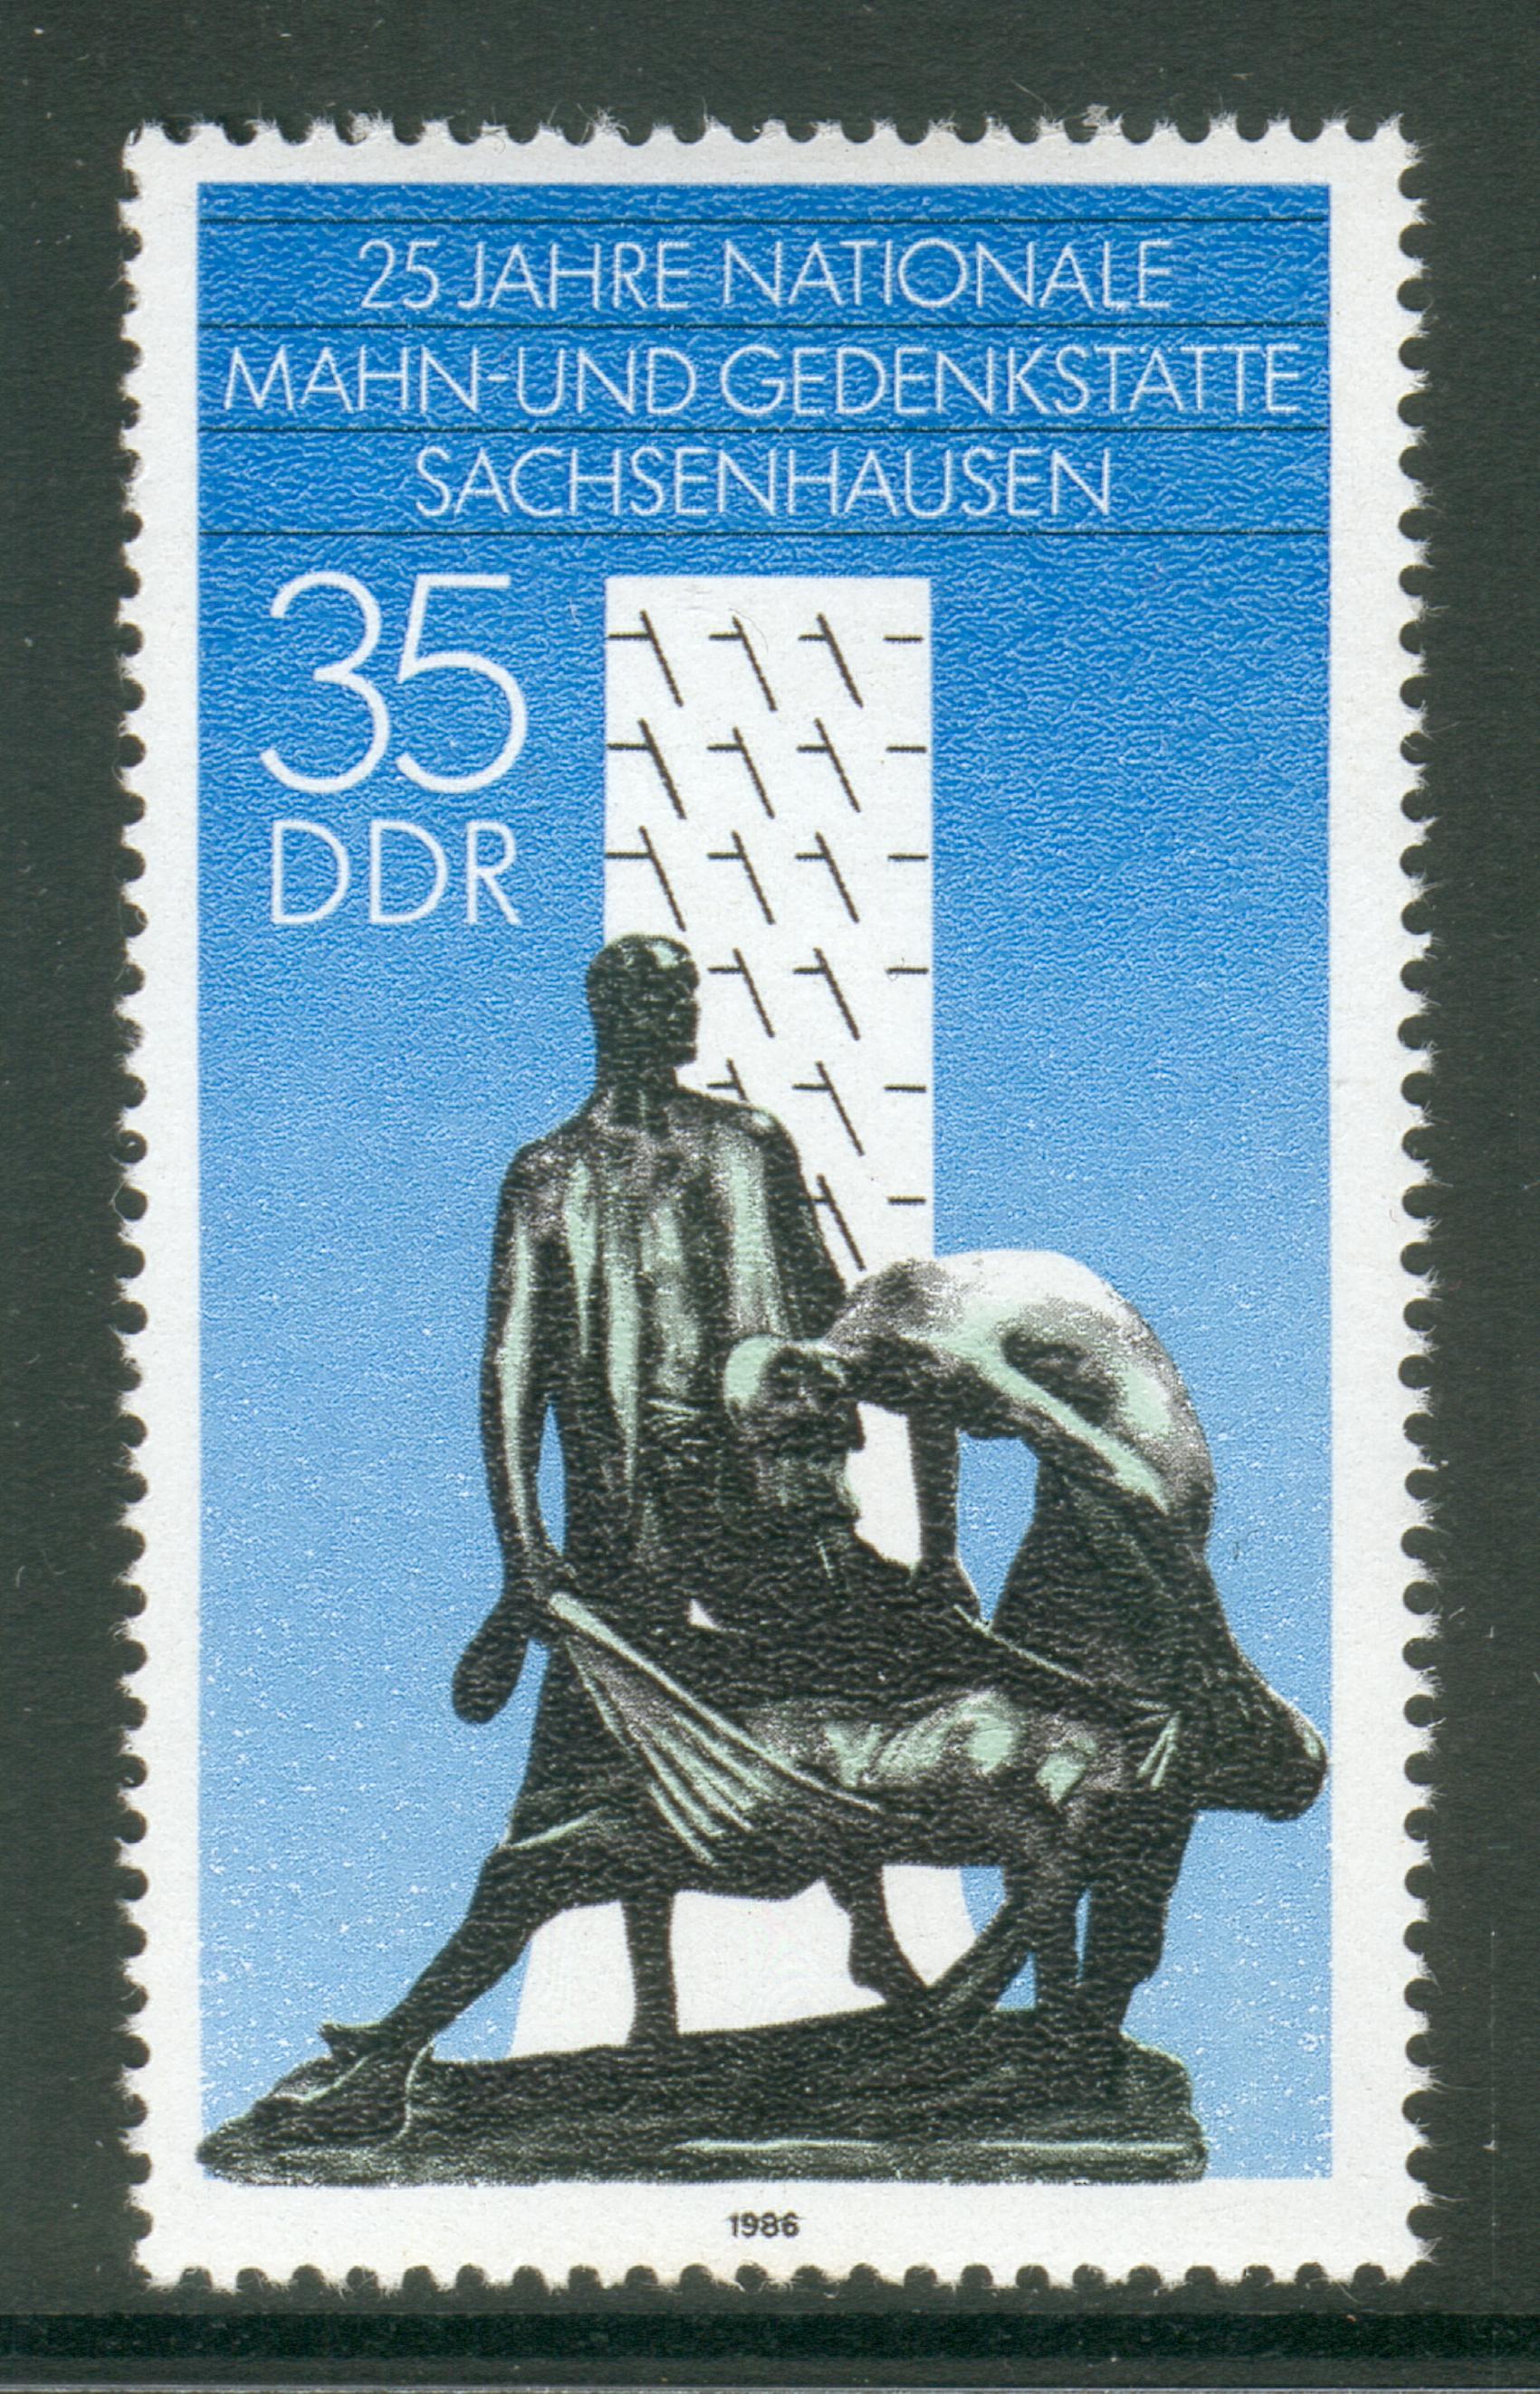 hb57.jpg